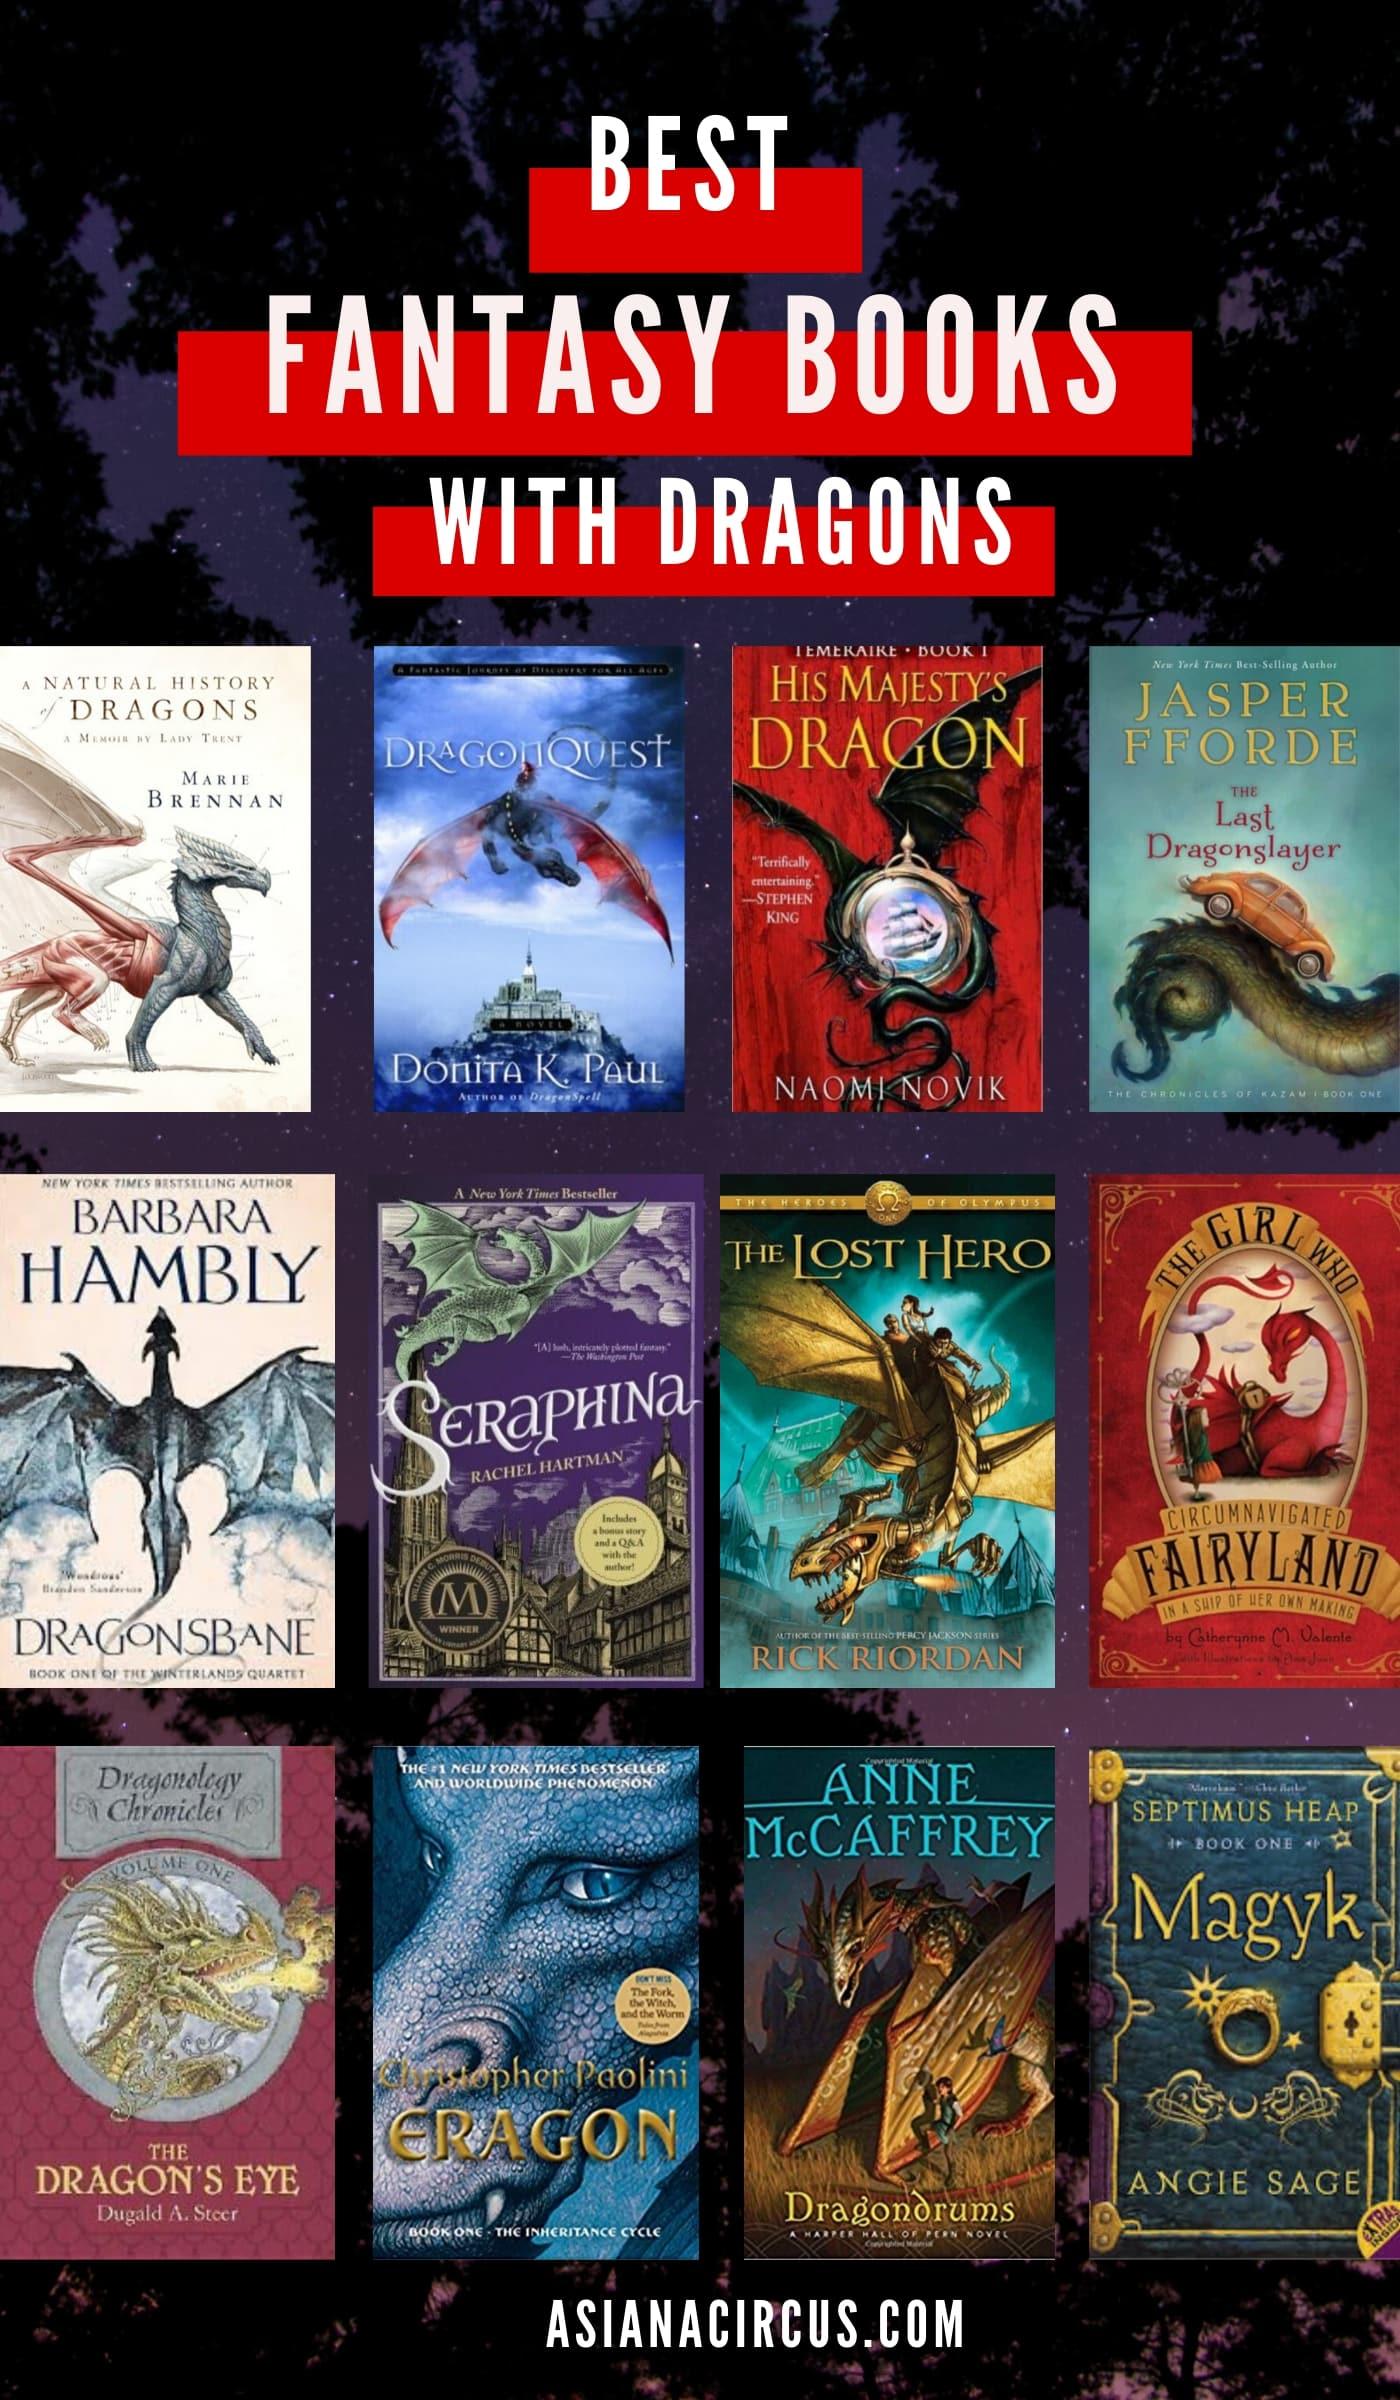 Must read fantasy dragon books - fantasy books with dragons